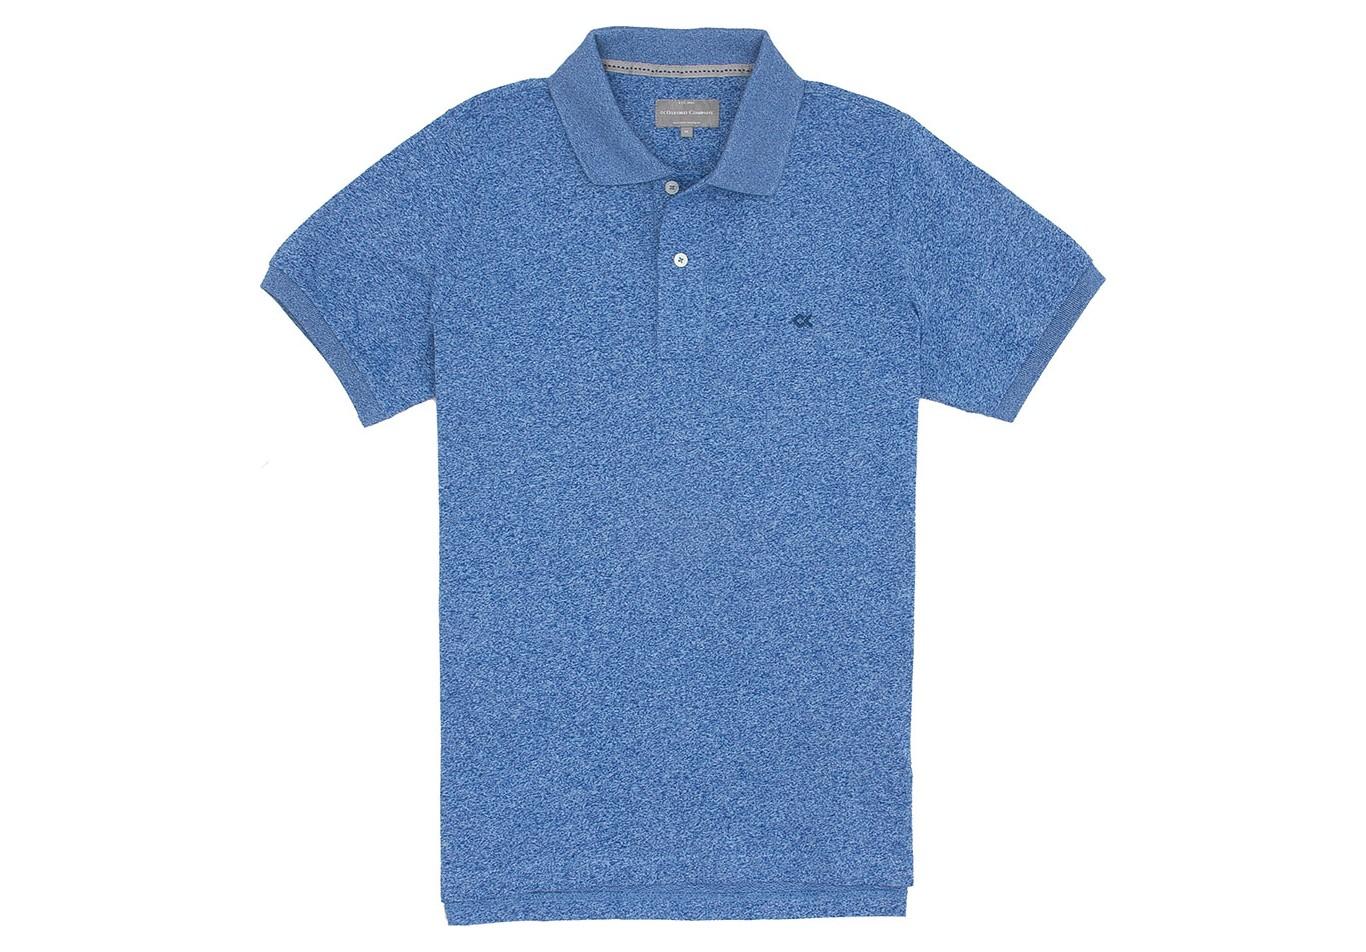 Stock Polo Κοντό Μανίκι Custom Fit Μπλε Ανοιχτό  07105196bdd